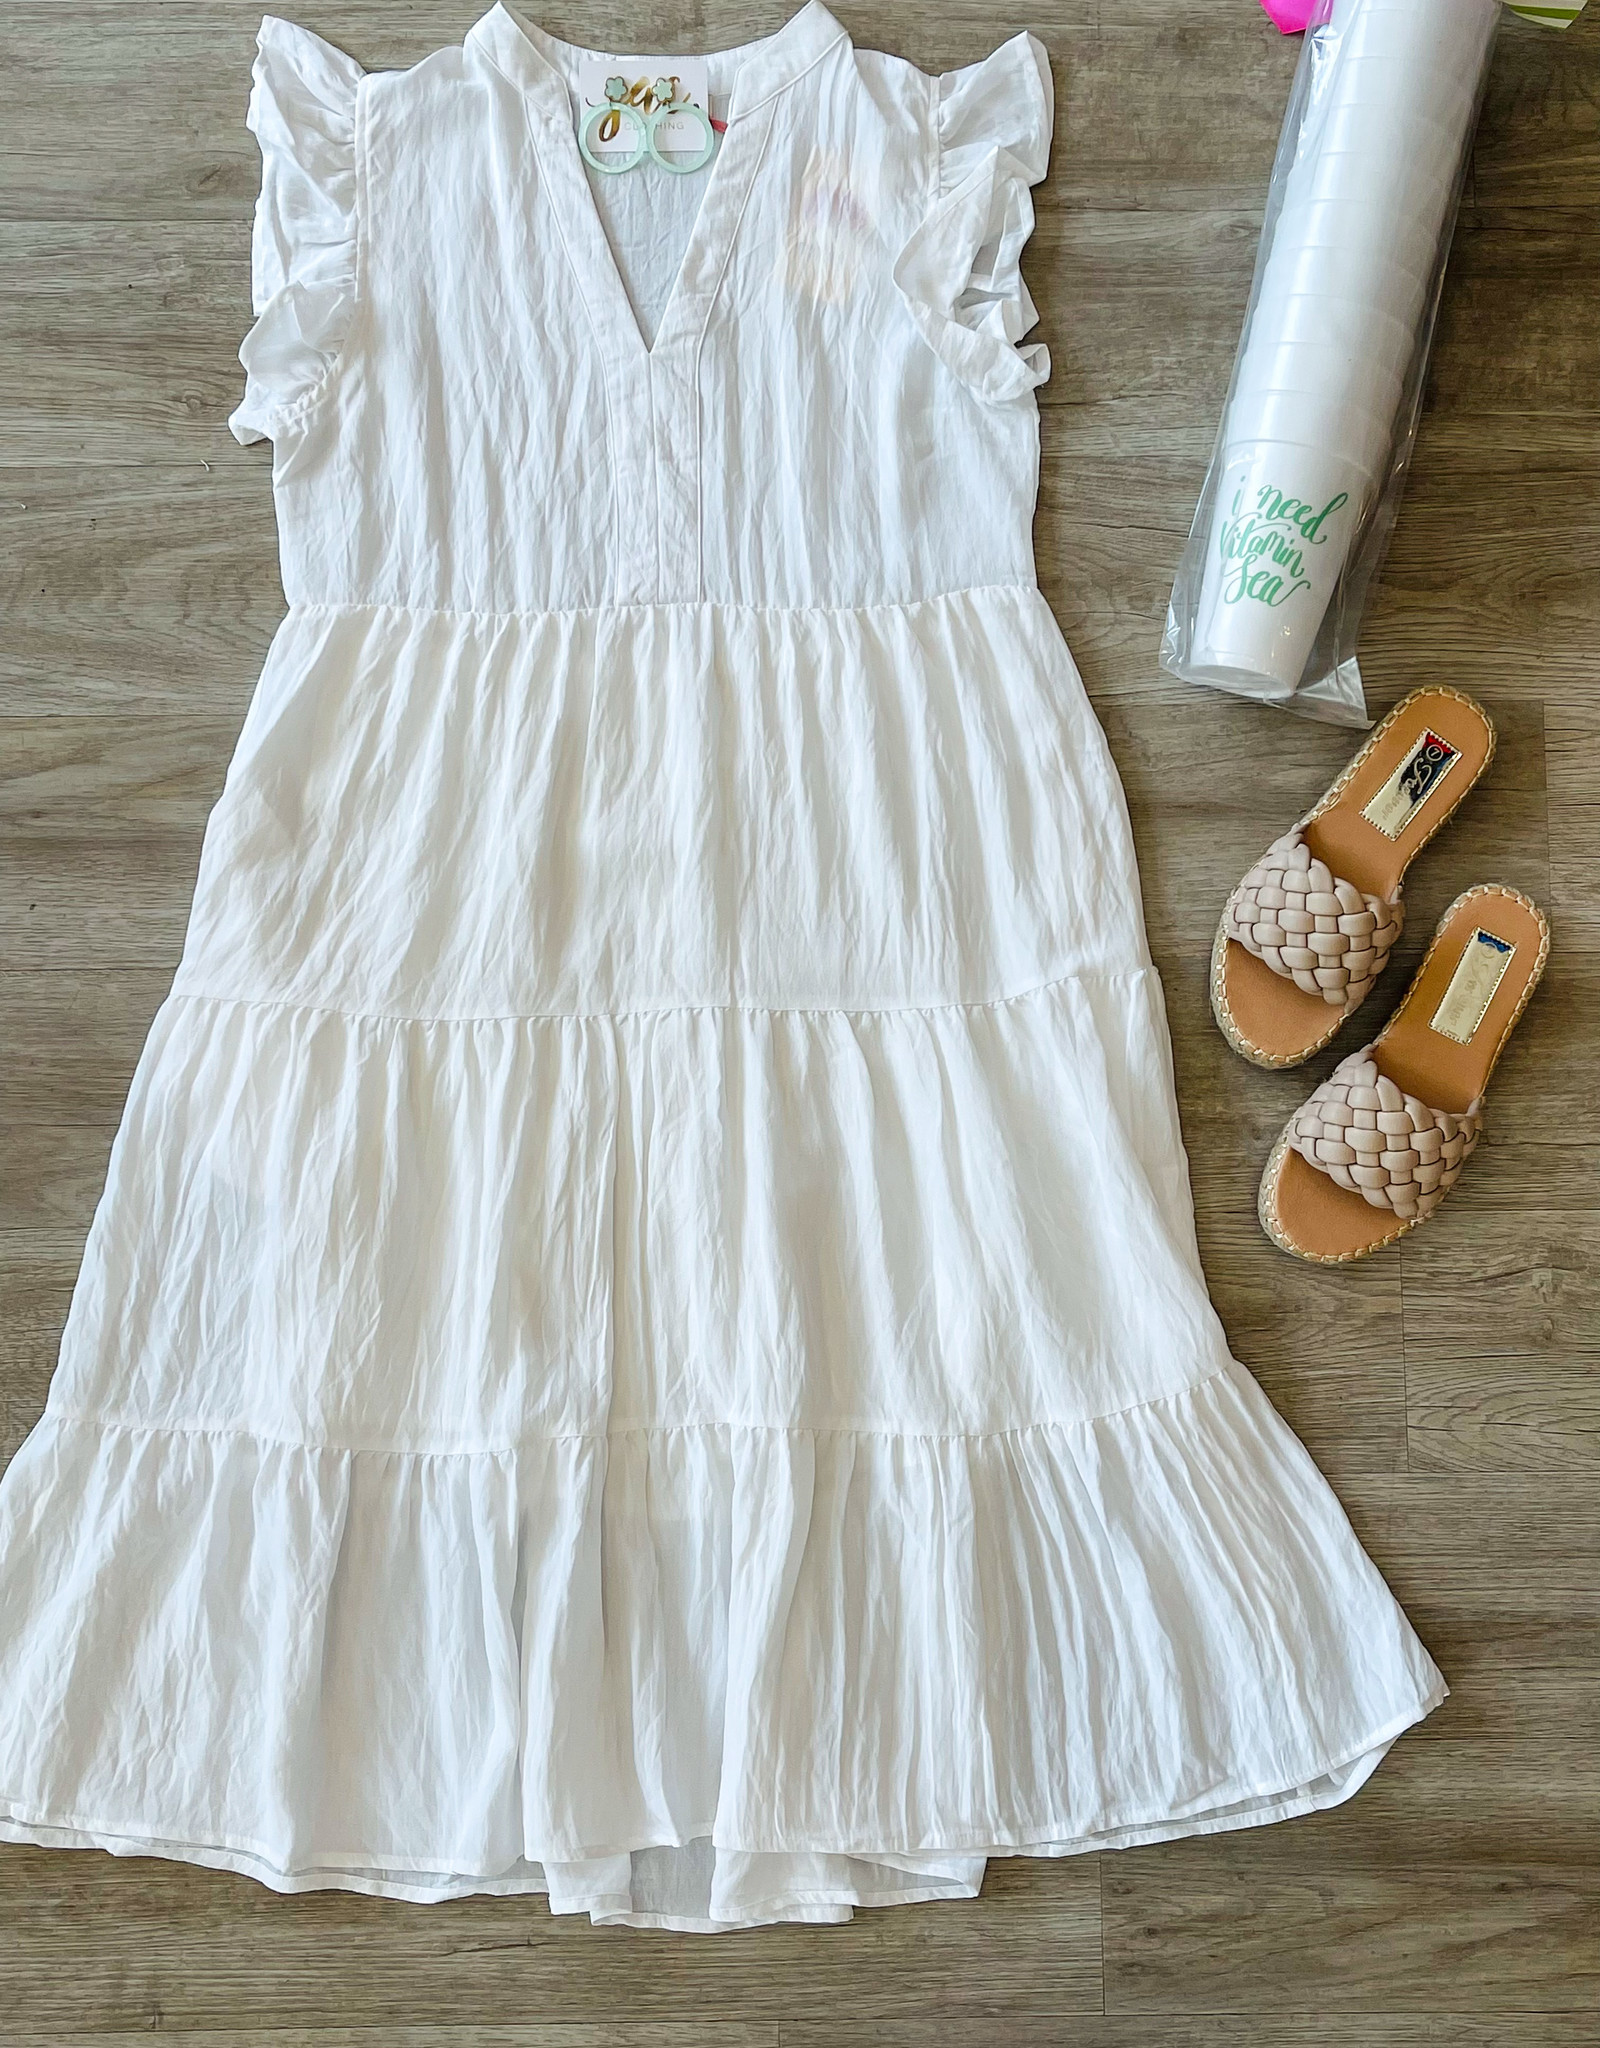 Beach Day Dress